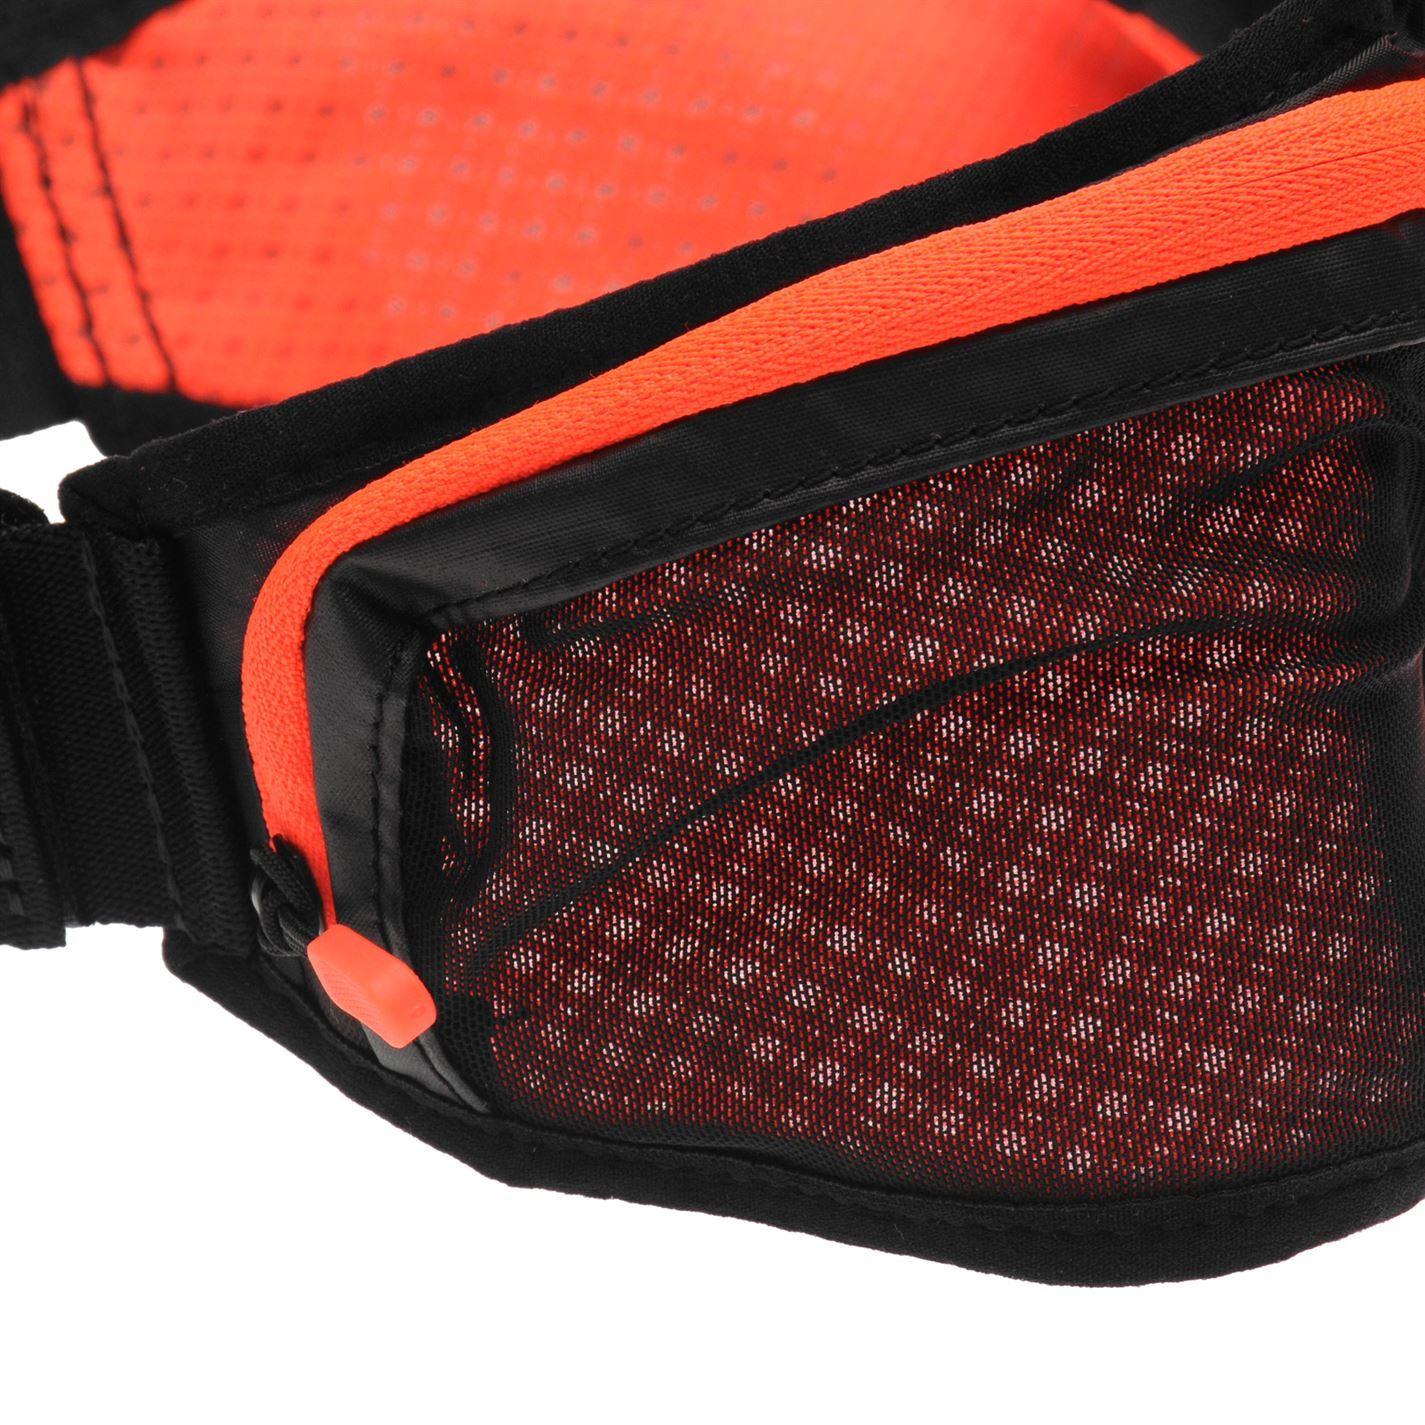 ... Boccetta di Twin Nike Running Belt Black Red Jogging Marsupio Fanny Pack 3346c9b80df3